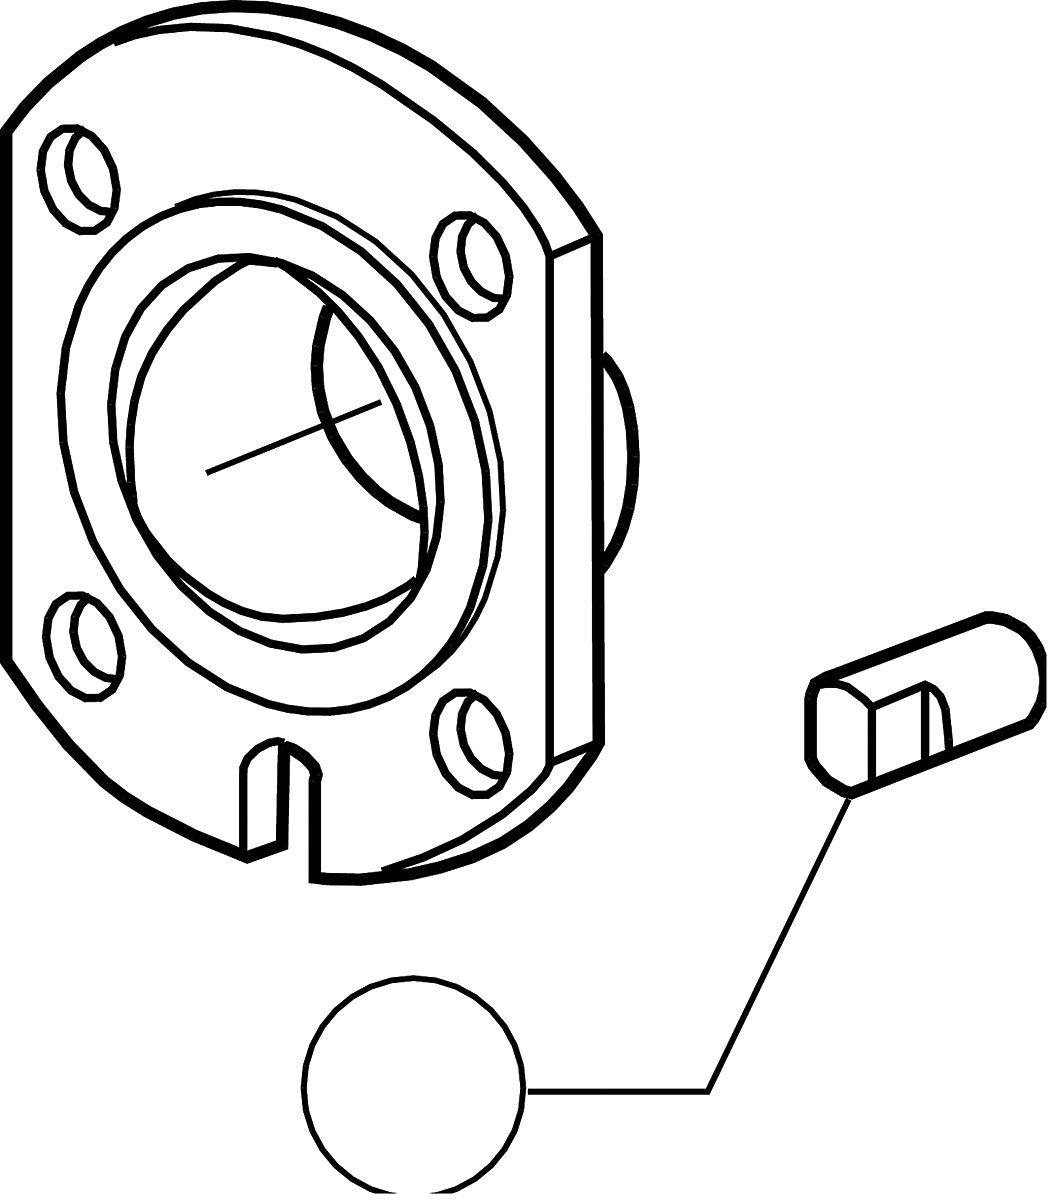 5252 015-02 Clamping Unit Sleeve Sandvik Coromant